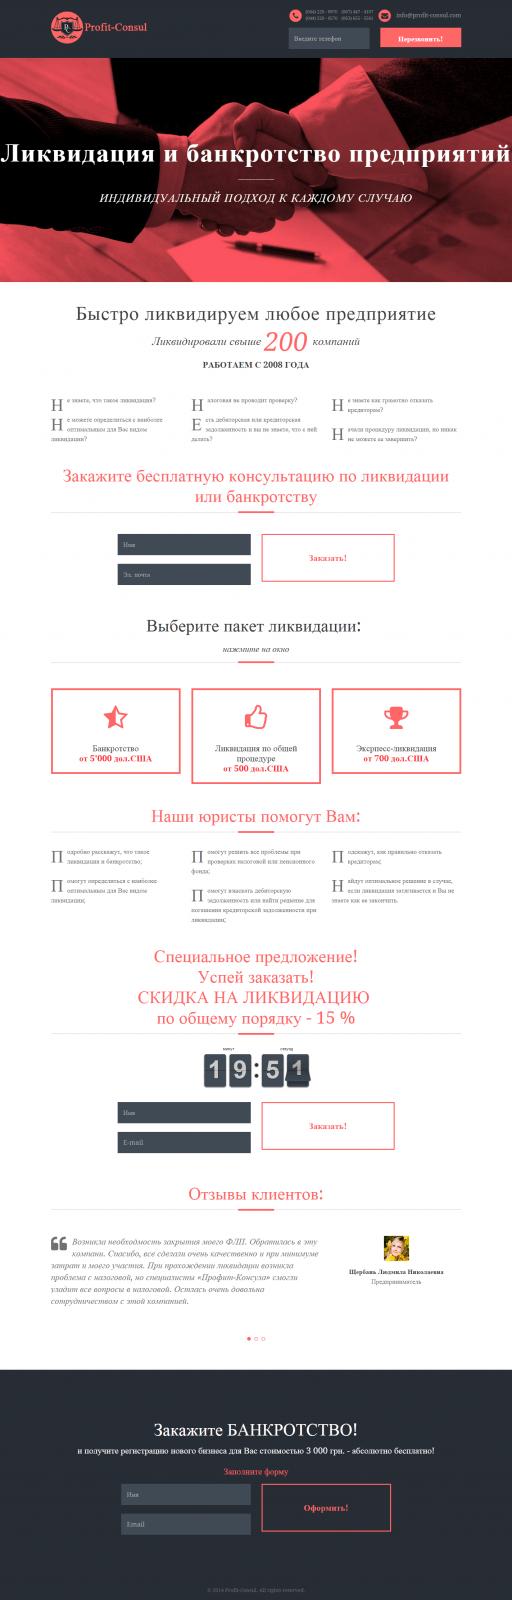 Likvidatsiya-predpriyatiy-likvidatsiya-OOO-likvidatsiya-SPD-lyuboy-rayon-Kieva-i-oblasti